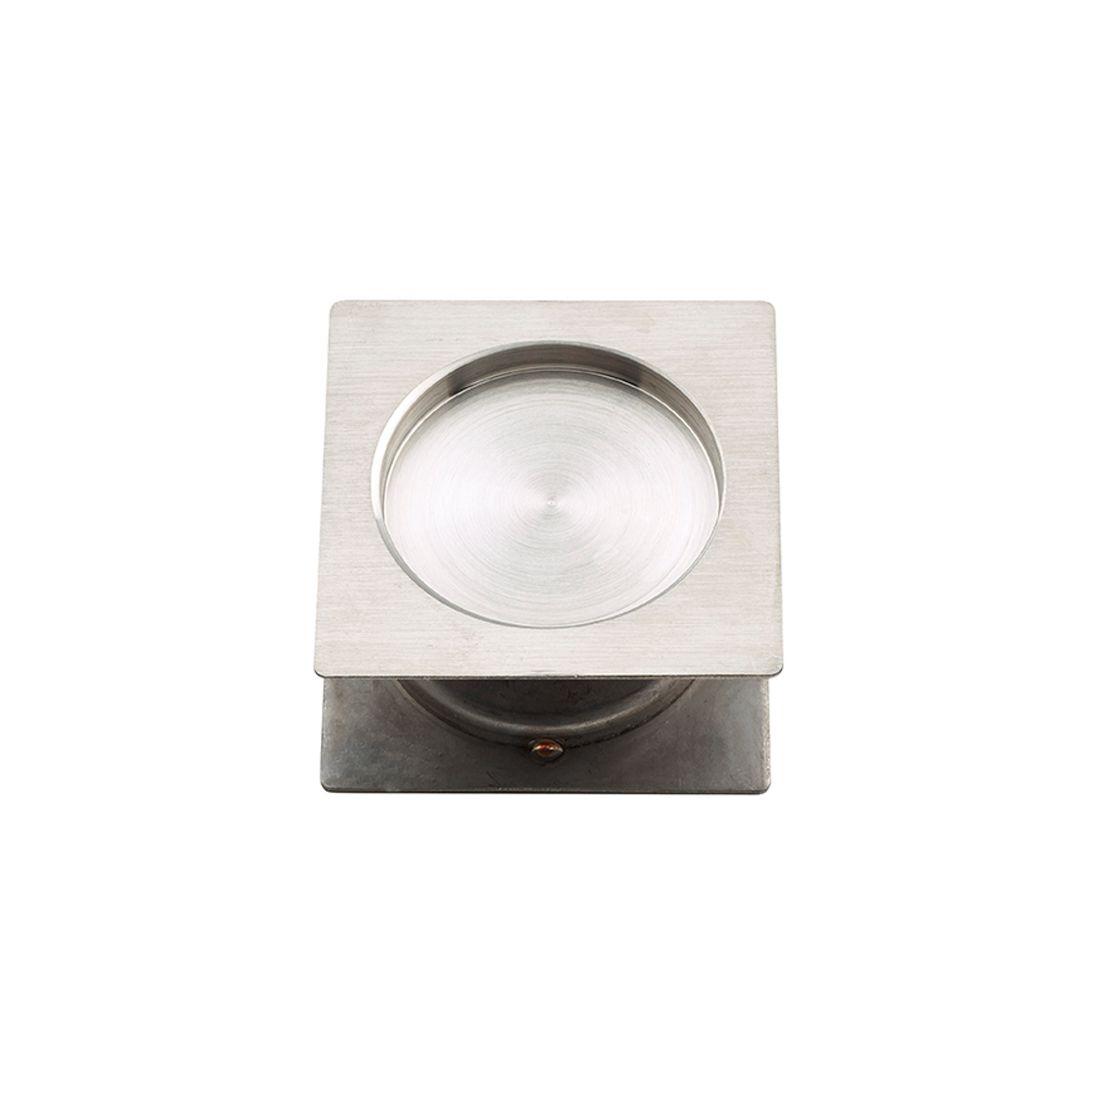 CavitySuite Wardrobe Kit Square Stainless Steel